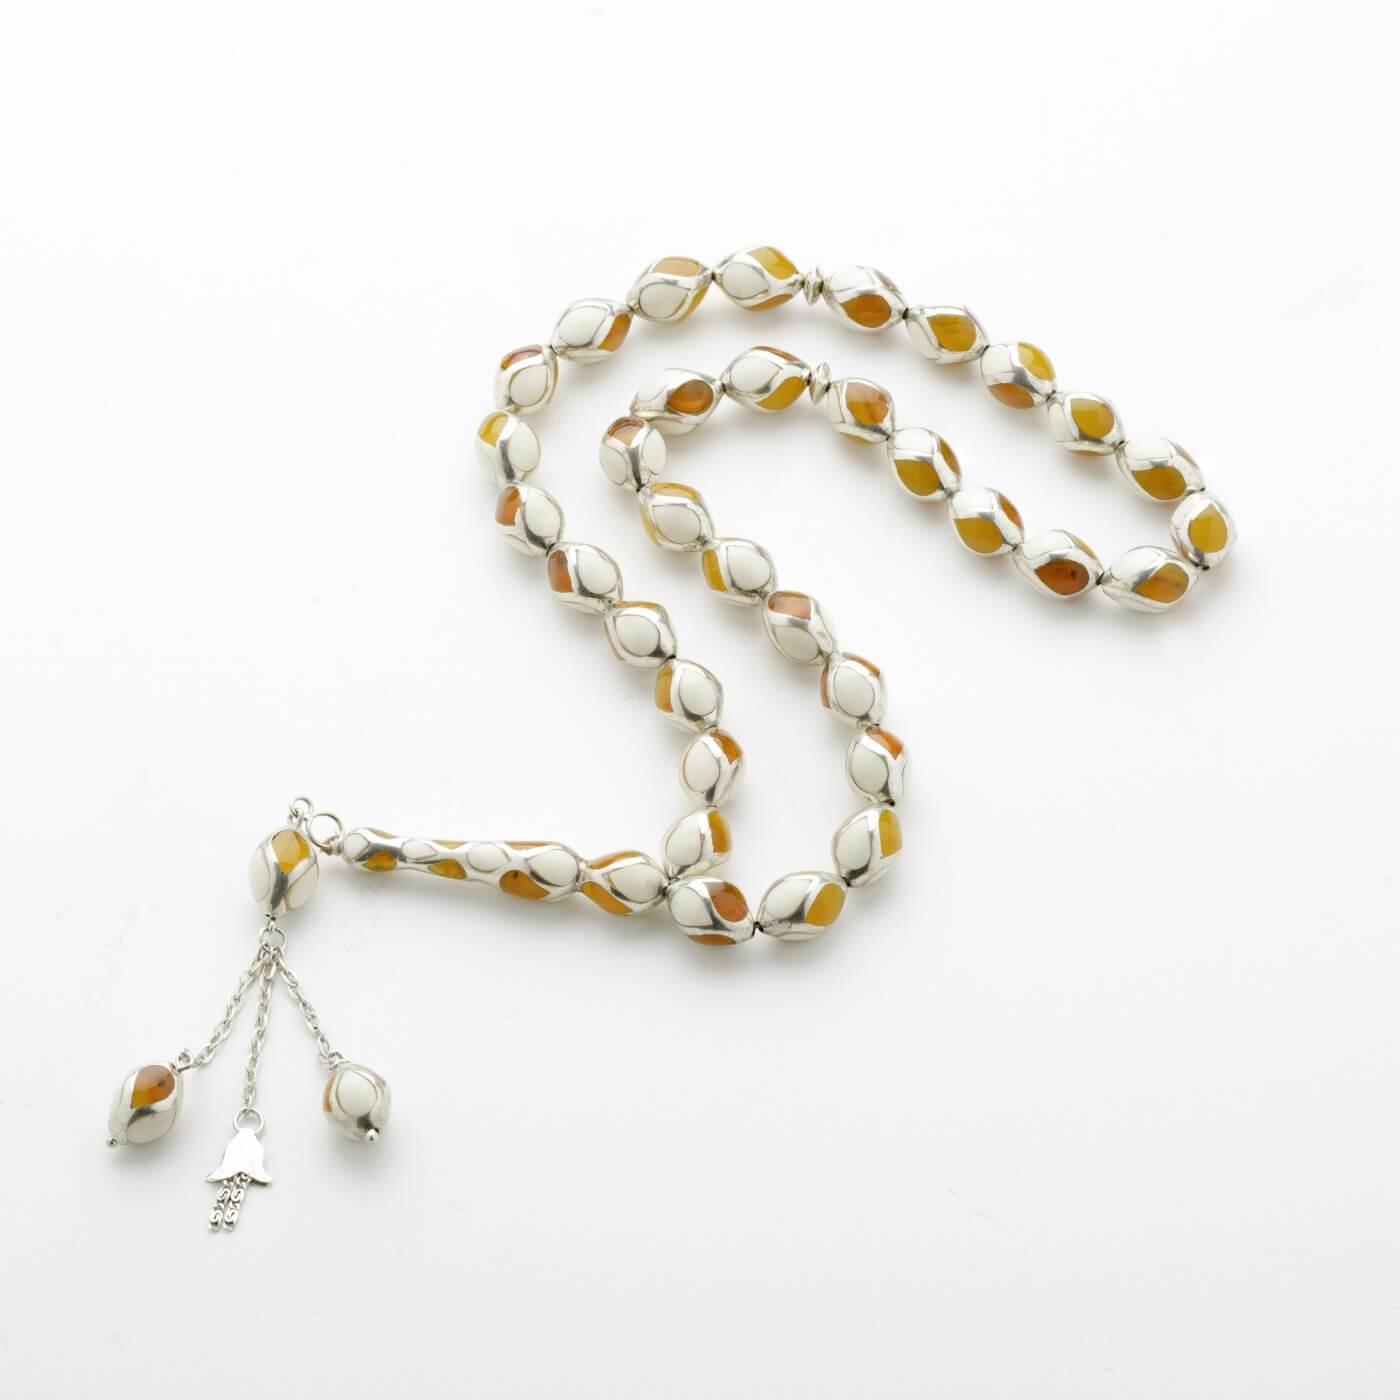 Ivory kahraman Prayer Beads with Silver1